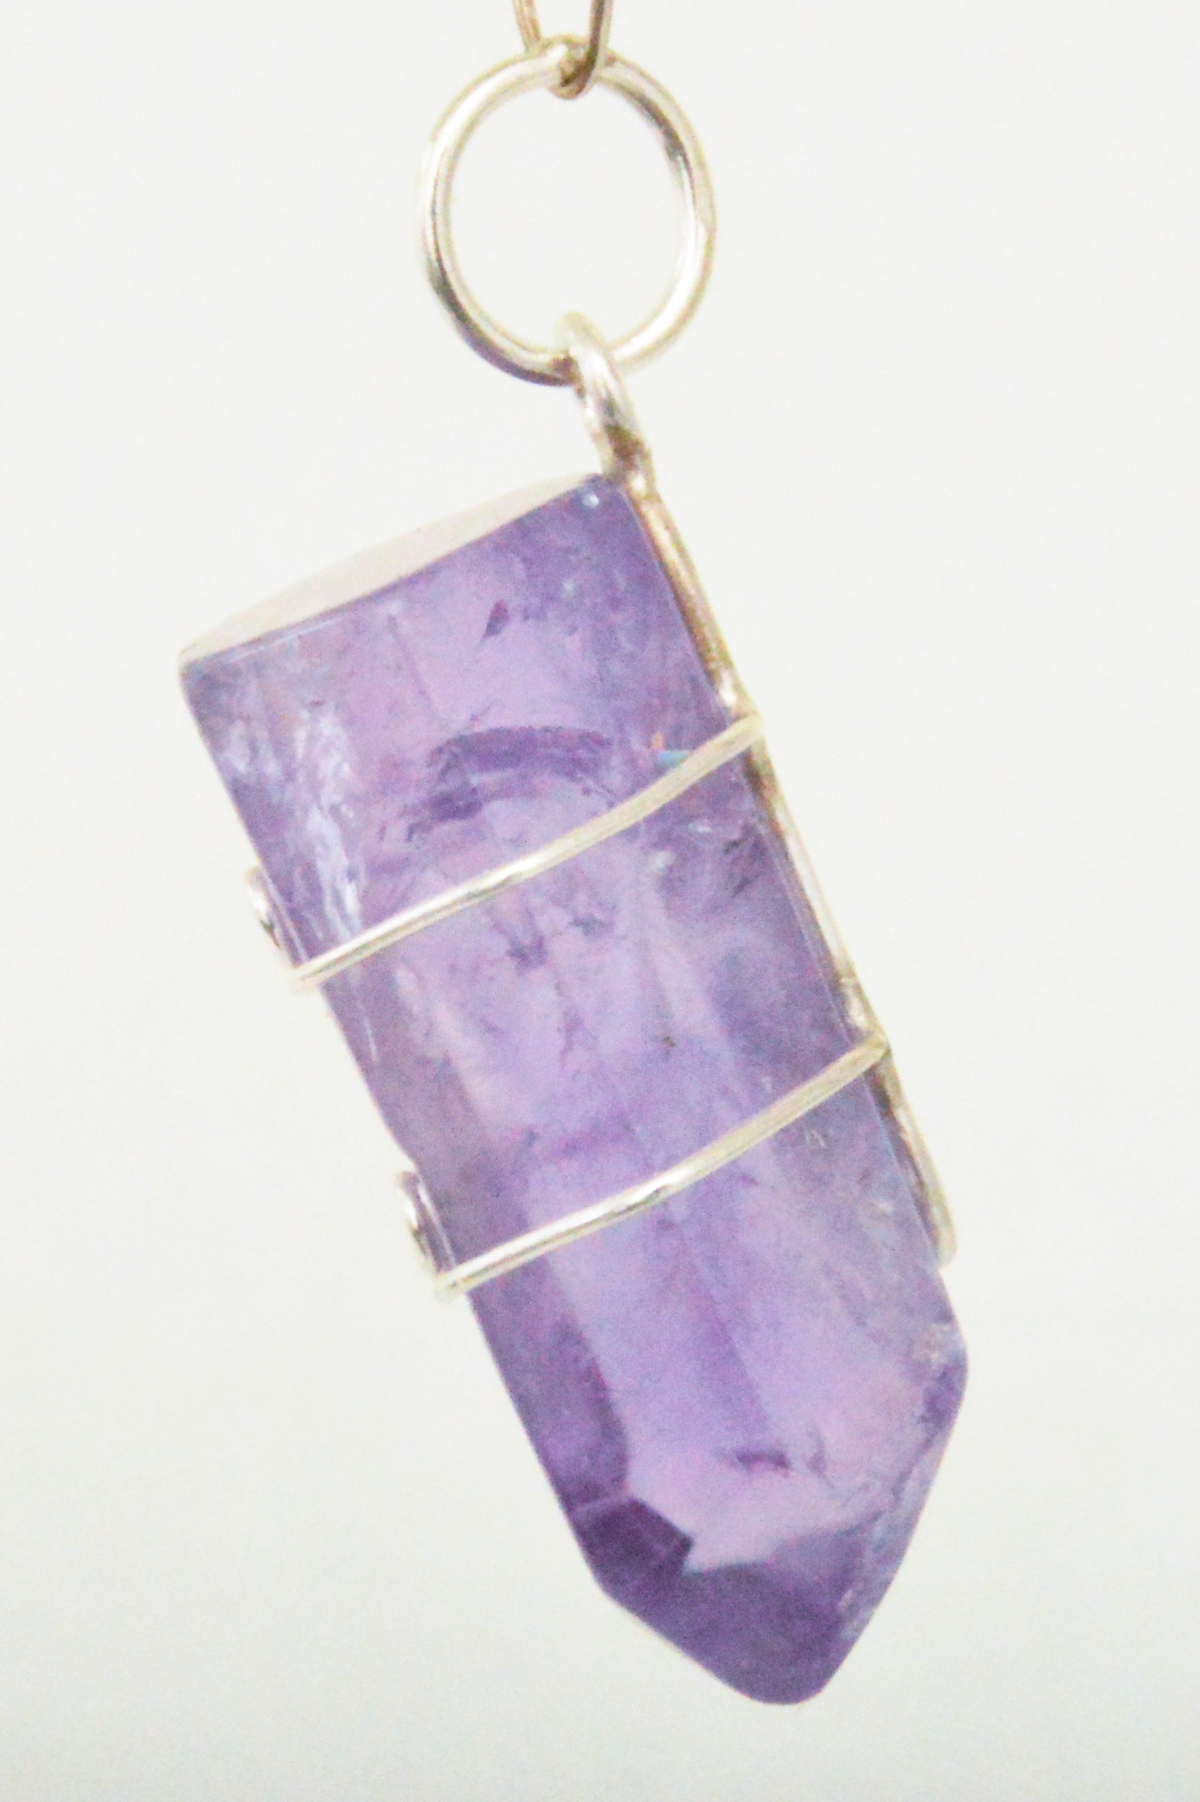 Casa Crystals & Jewelry Pendant, Amethyst Wire Wrap Eyeglasses